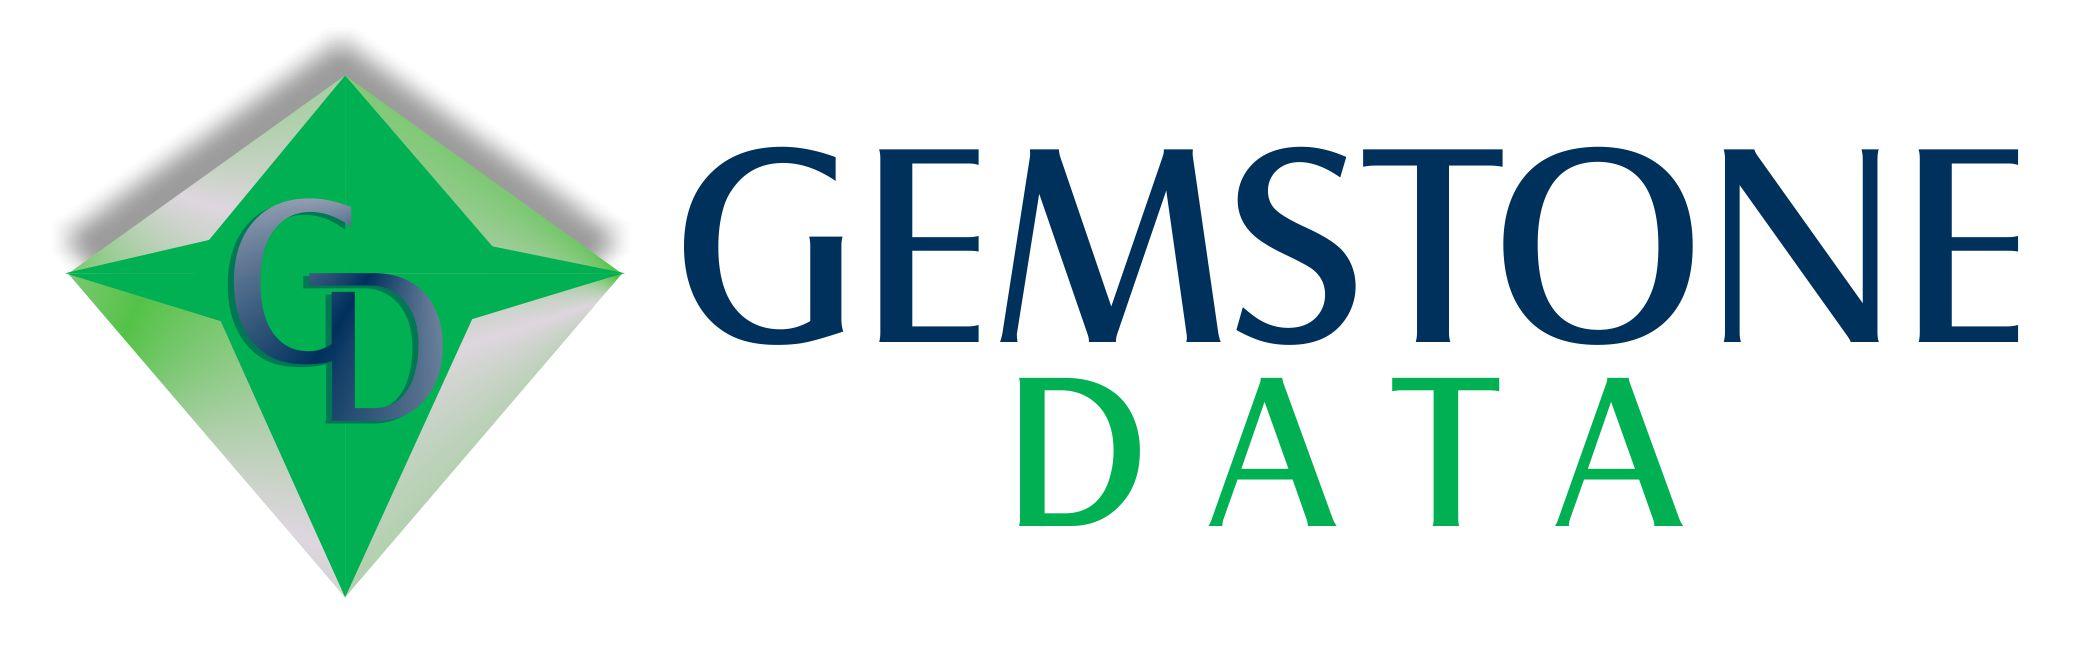 Gemstone Data Logo